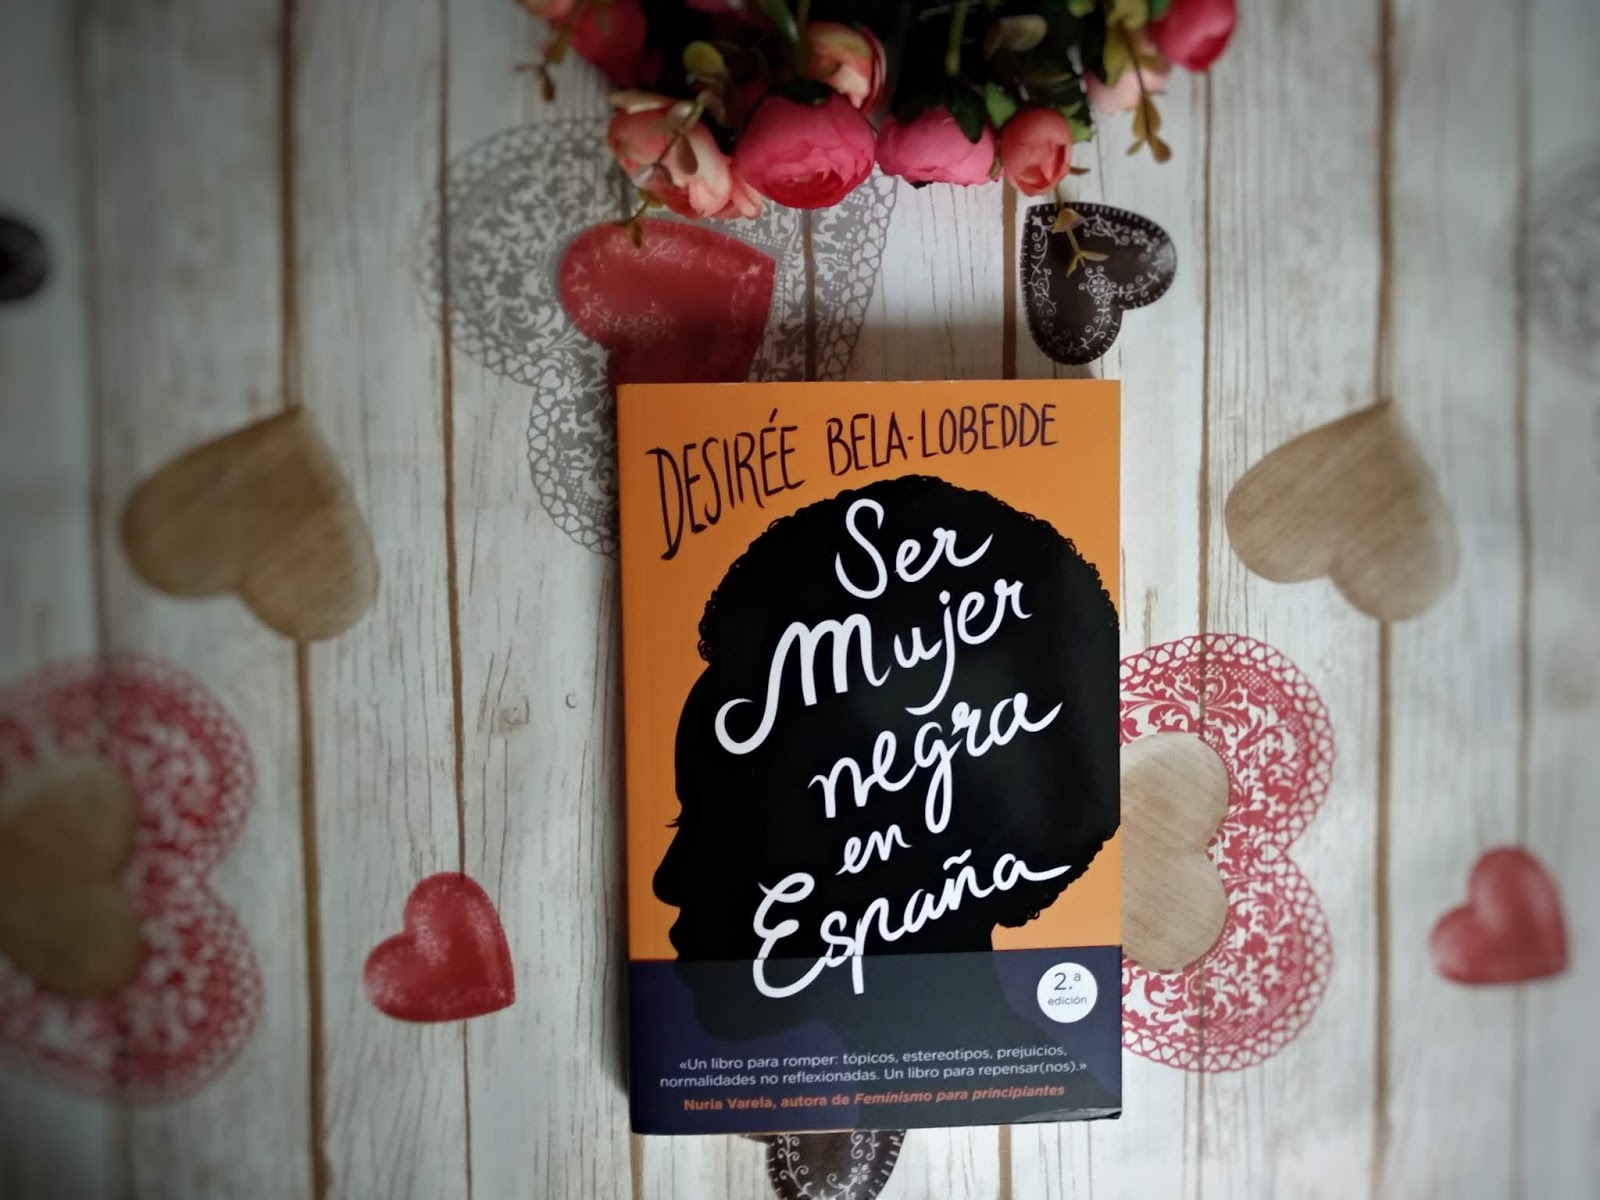 Mujer negra en España